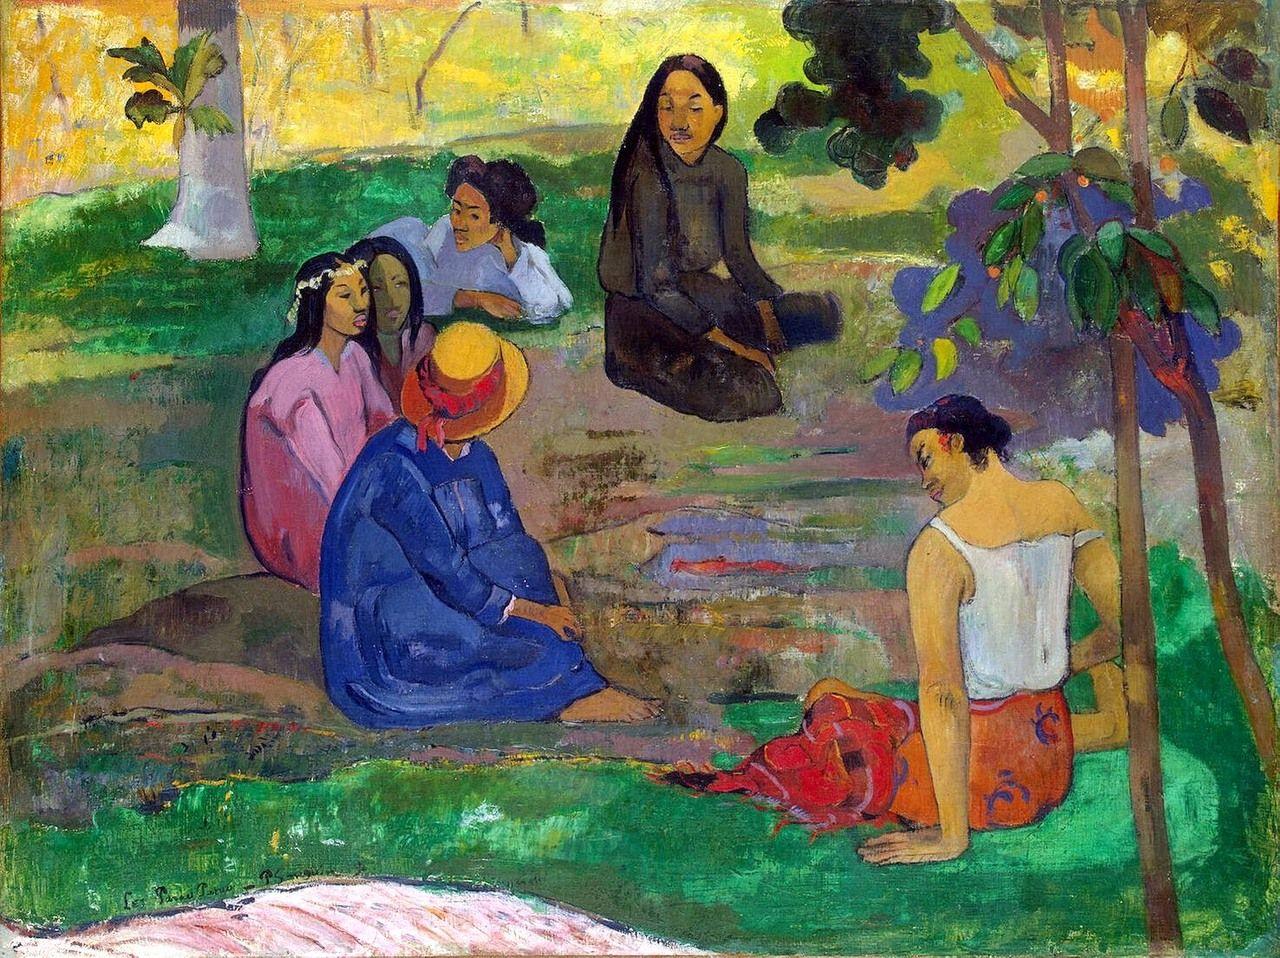 Les Parau Parauby Paul Gauguin | Paul Gauguin | Pinterest